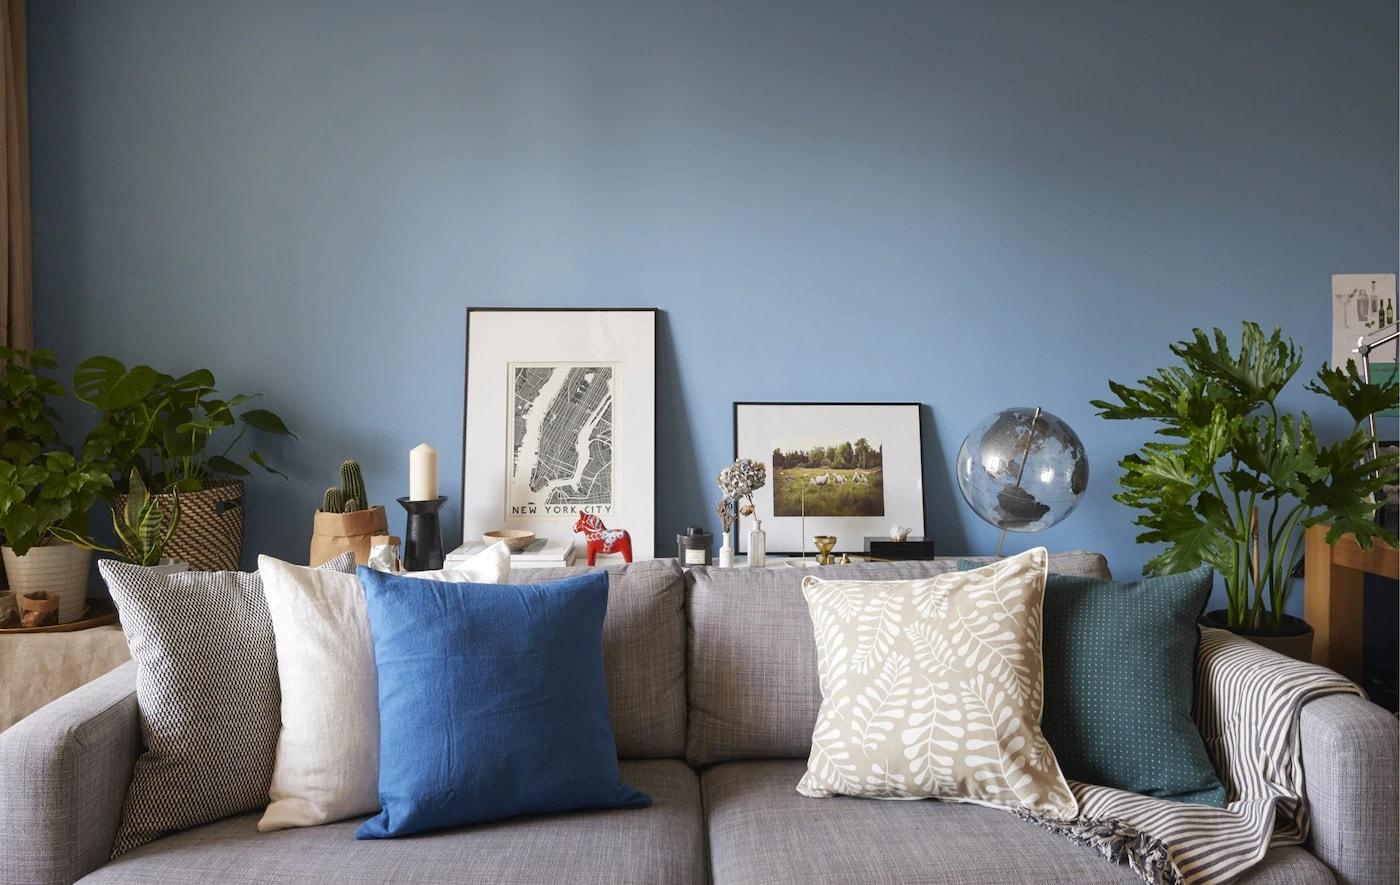 ikea duvar aksesuarlari ile dekorasyon fikirleri (8)-min